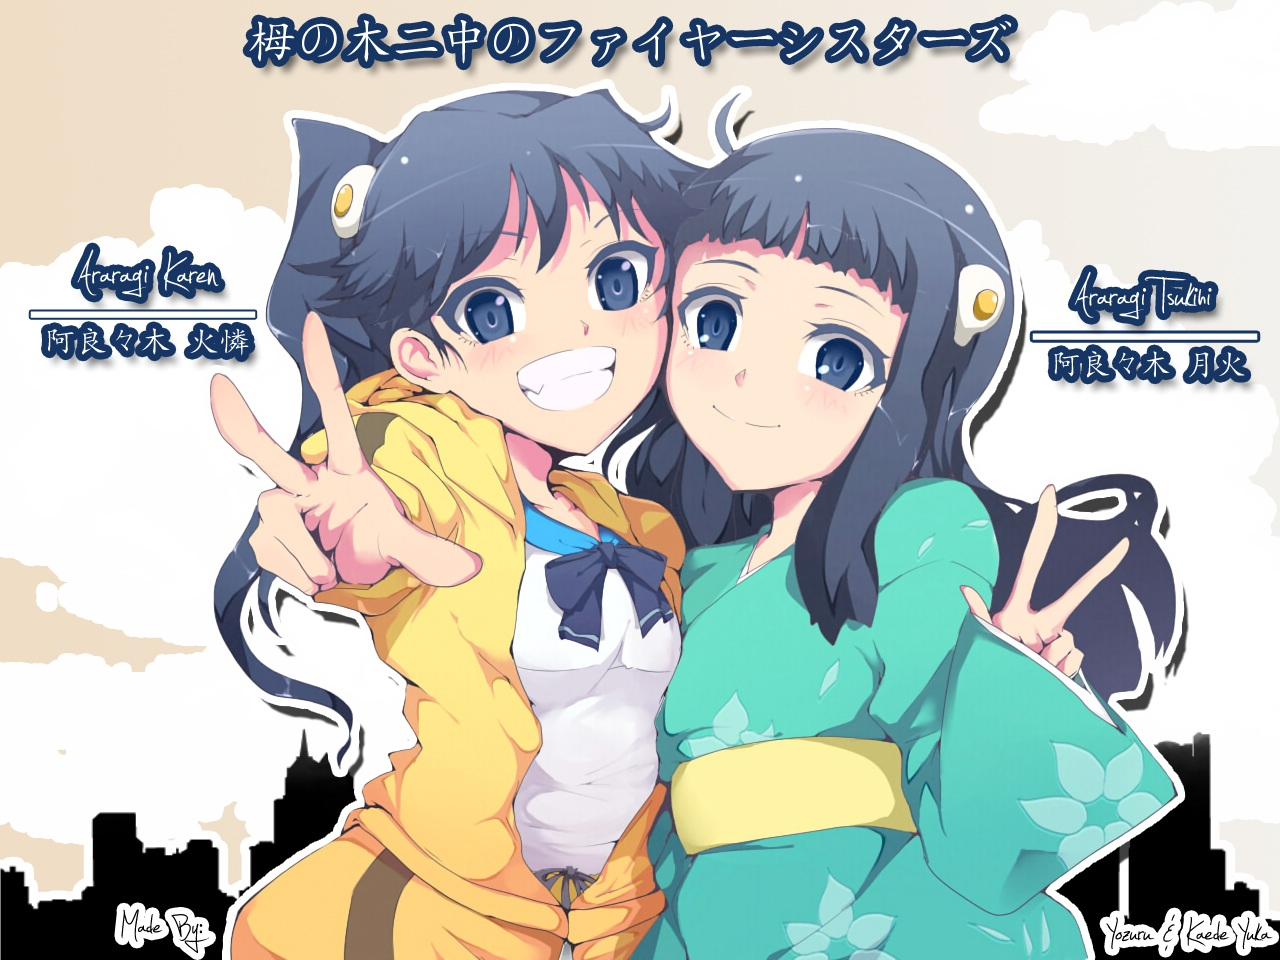 2girls araragi_karen araragi_tsukihi bakemonogatari bow japanese_clothes monogatari_(series) nisemonogatari shorts tagme_(artist) twins